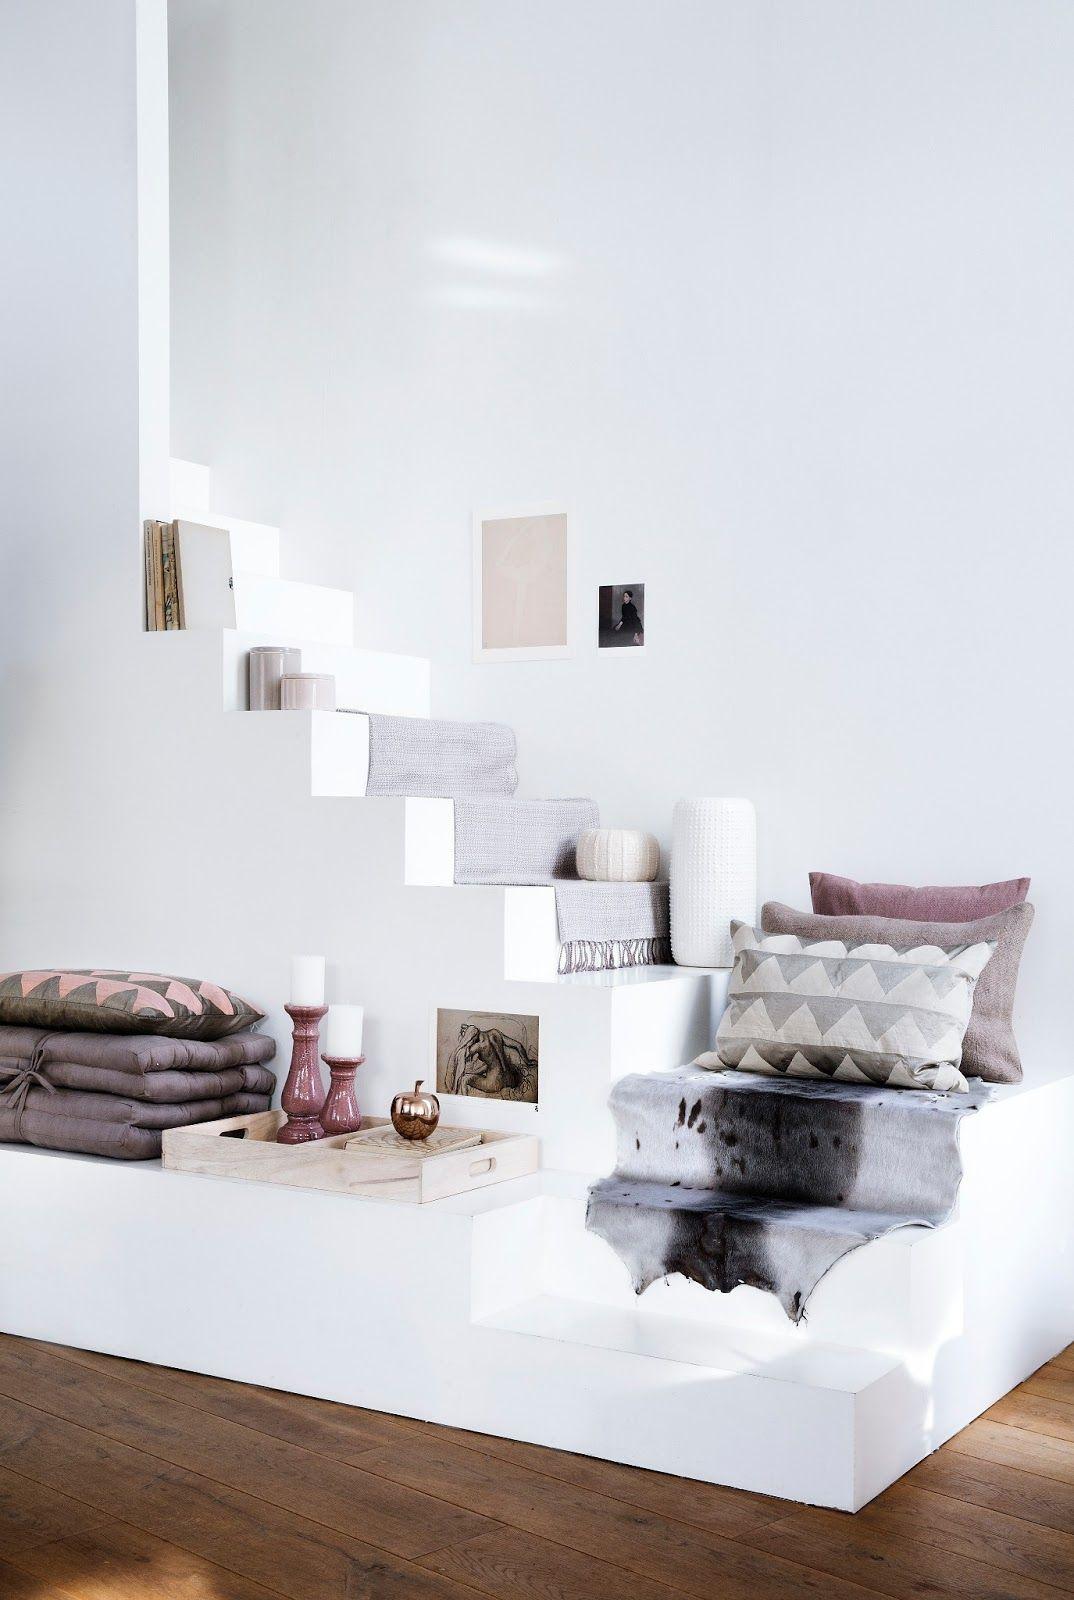 My dream home interior design my dream home  shadowflower  my dream home  pinterest  interiors